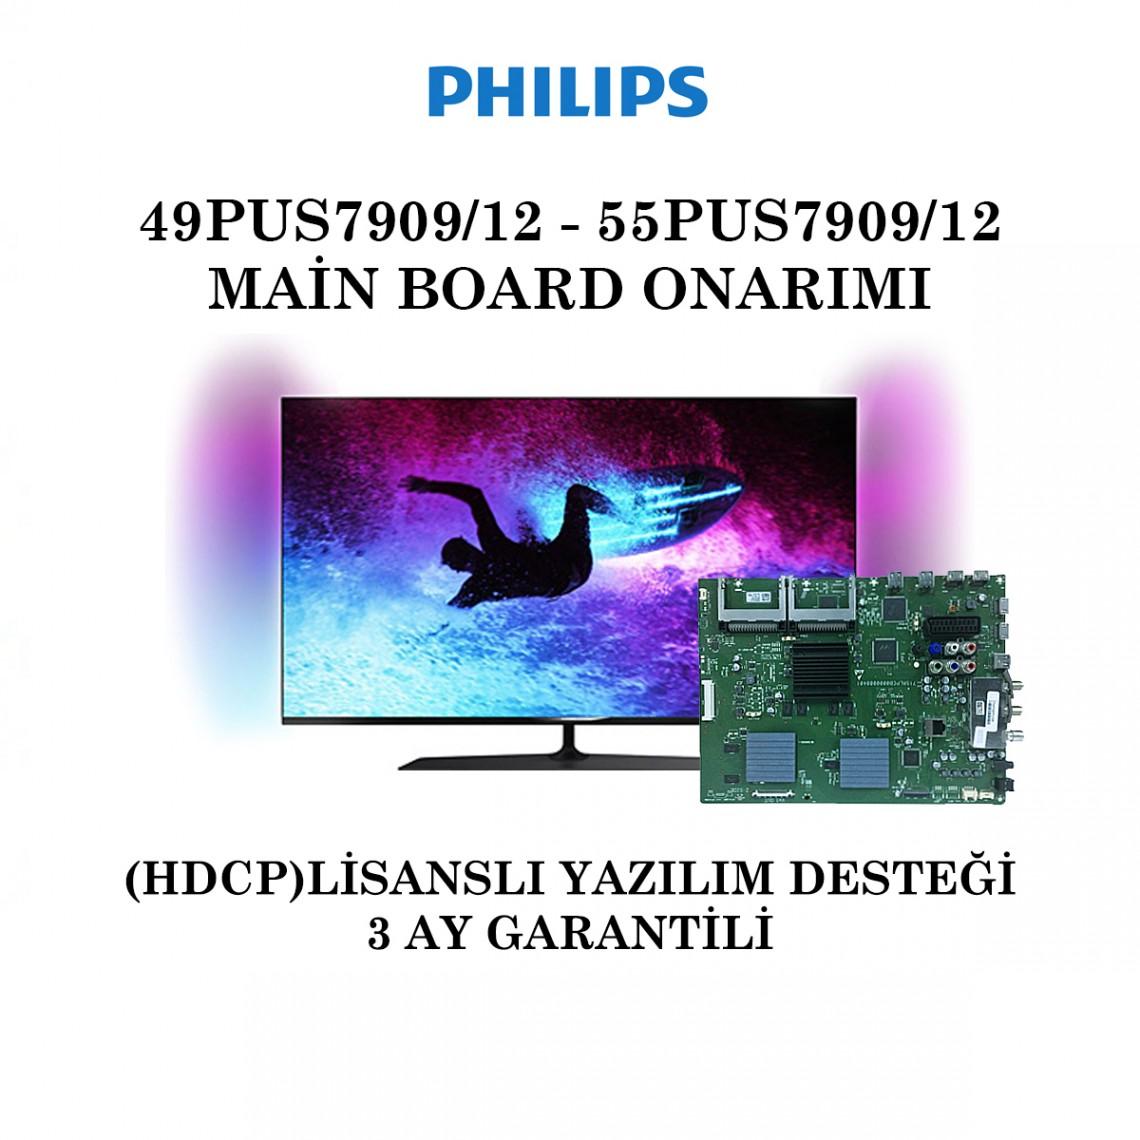 PHILIPS , 715RLPCB0000000401 , 49PUS7909/12 , 55PUS7909/12 , QV14.1E , Main Board Onarımı